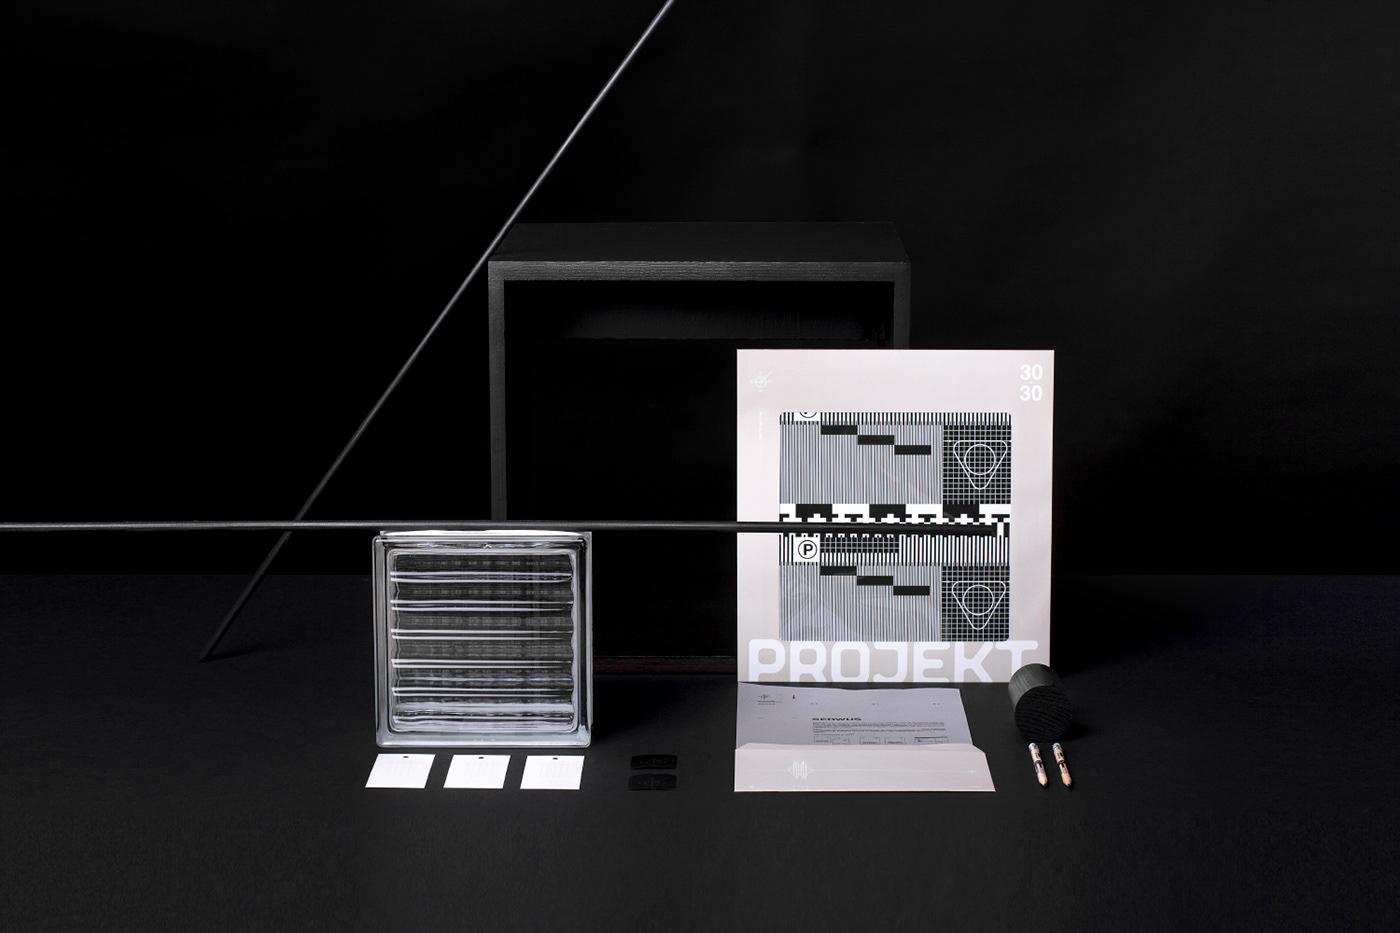 logo identity logoinspiration visualart modern futuristic Packaging brand print Label